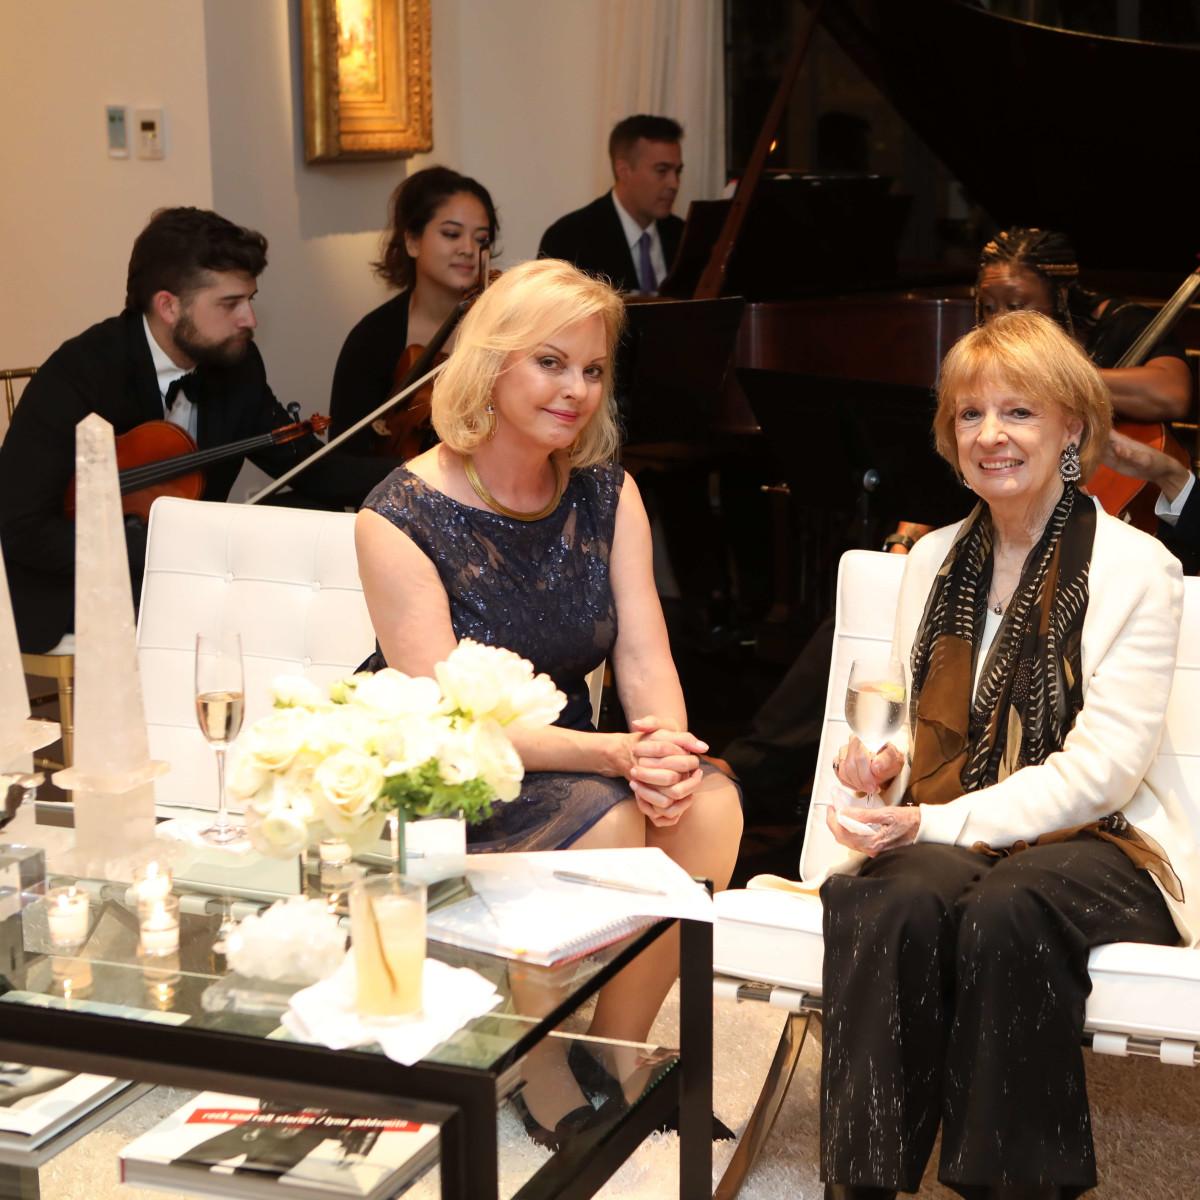 Houston, Cynthia and Anthony Petrello cocktail reception for Tommy Tune, Nov. 2016, Karen Bradshaw, Sandy Godfrey